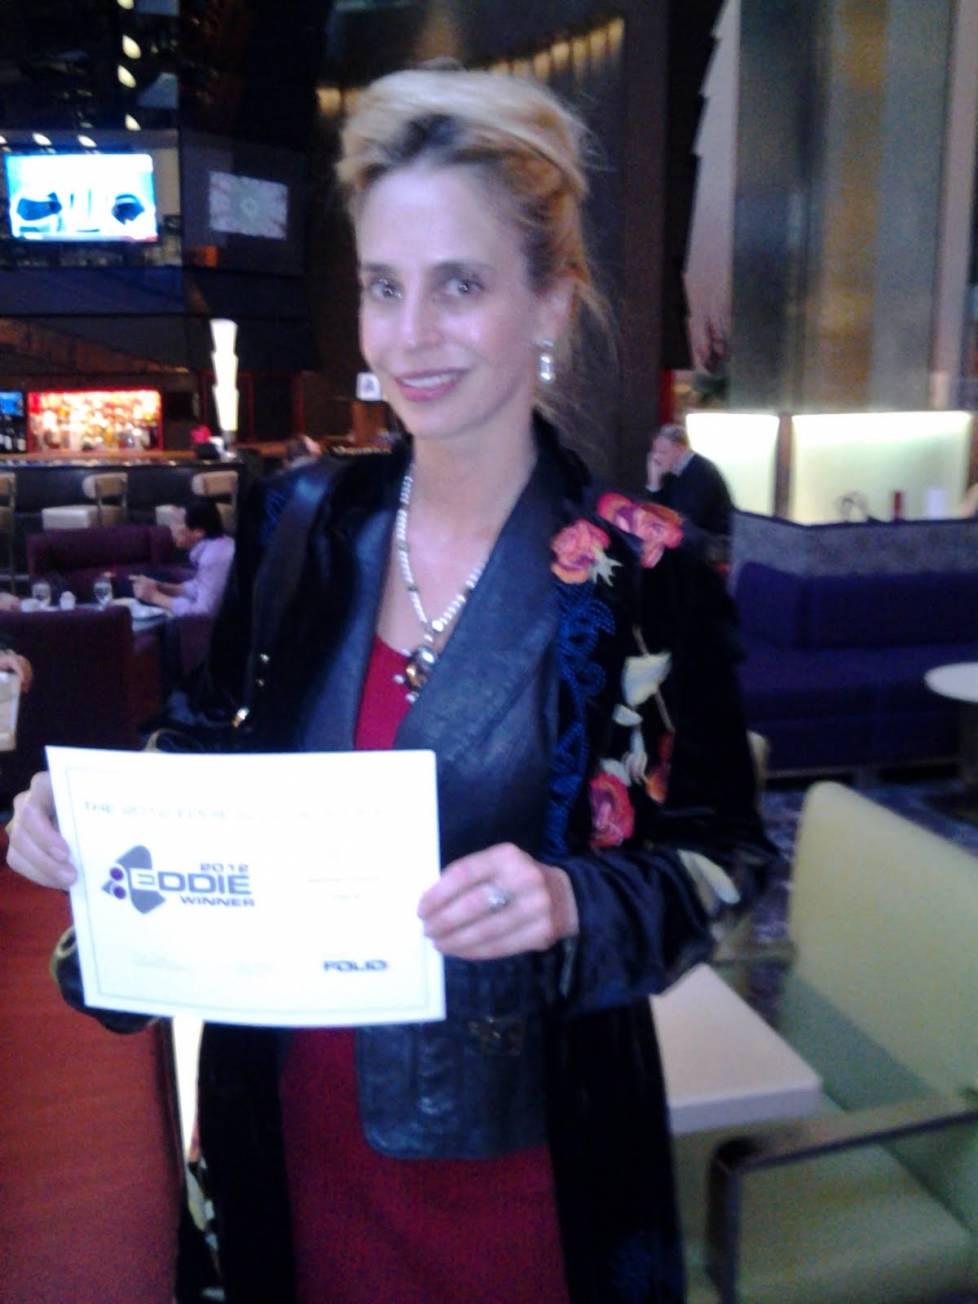 Vivian Van Dijk, Editor-in-Chief at Eddie and Ozzie Awards